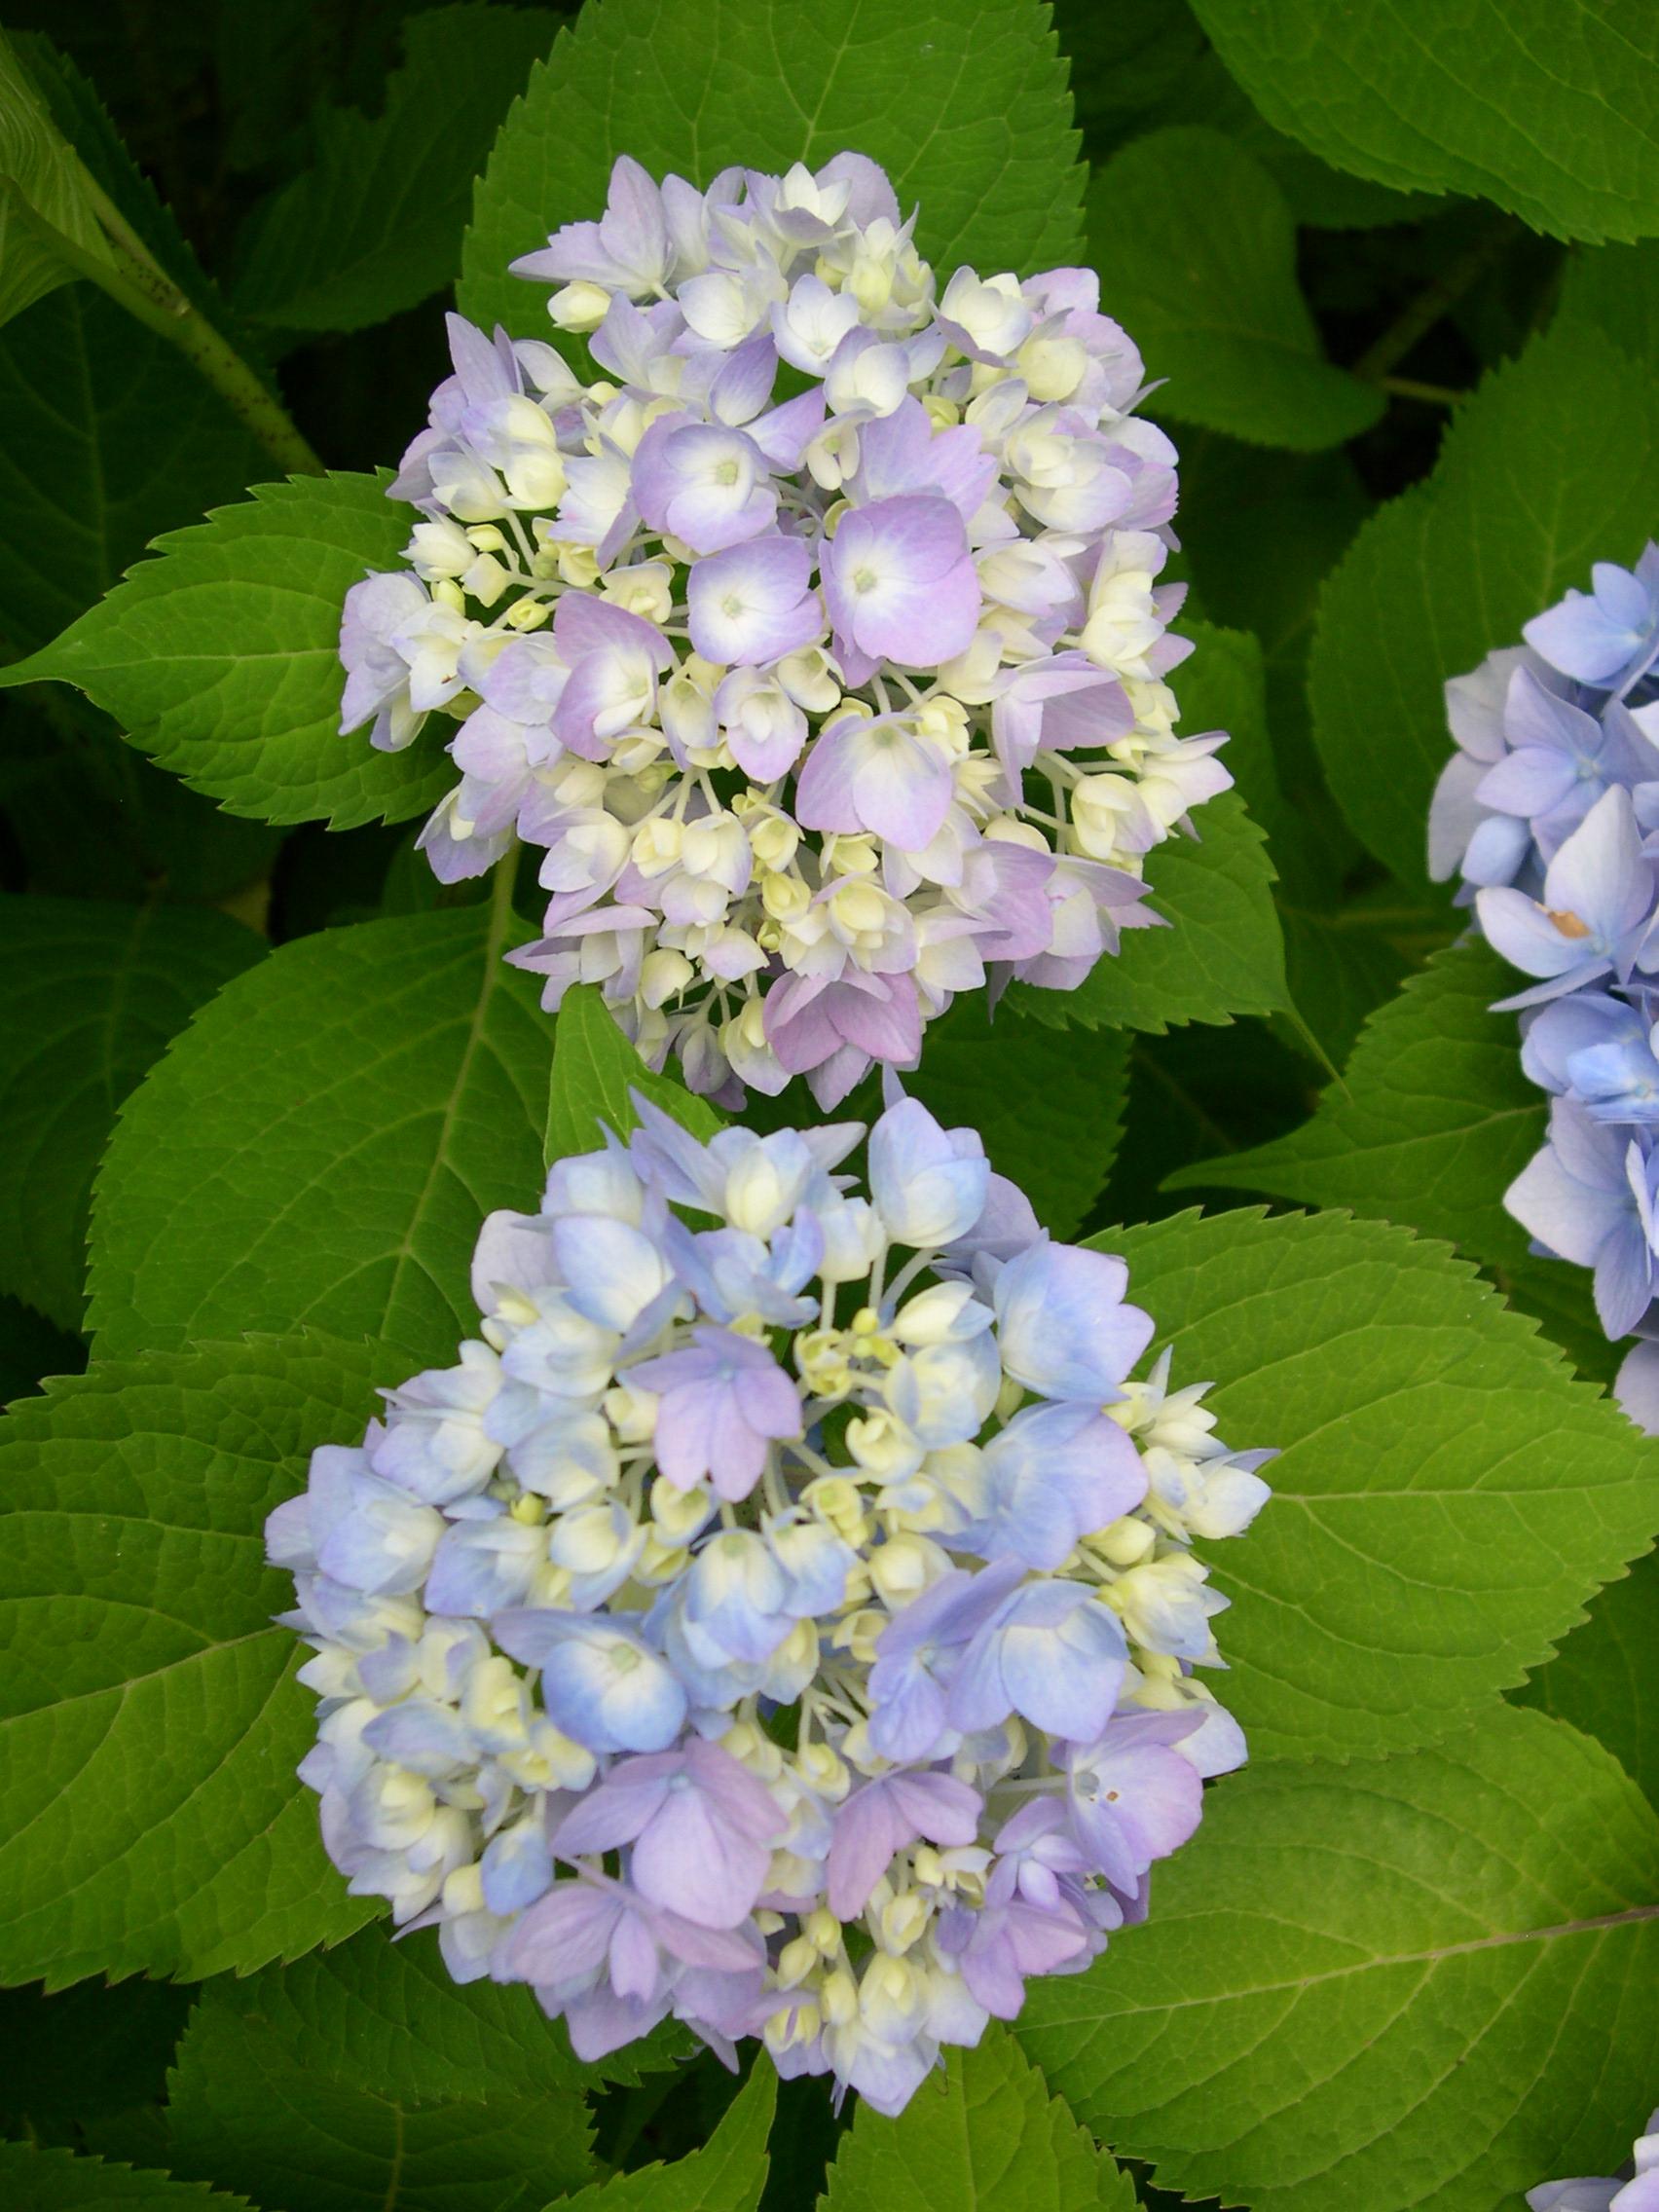 hydrangea blooms